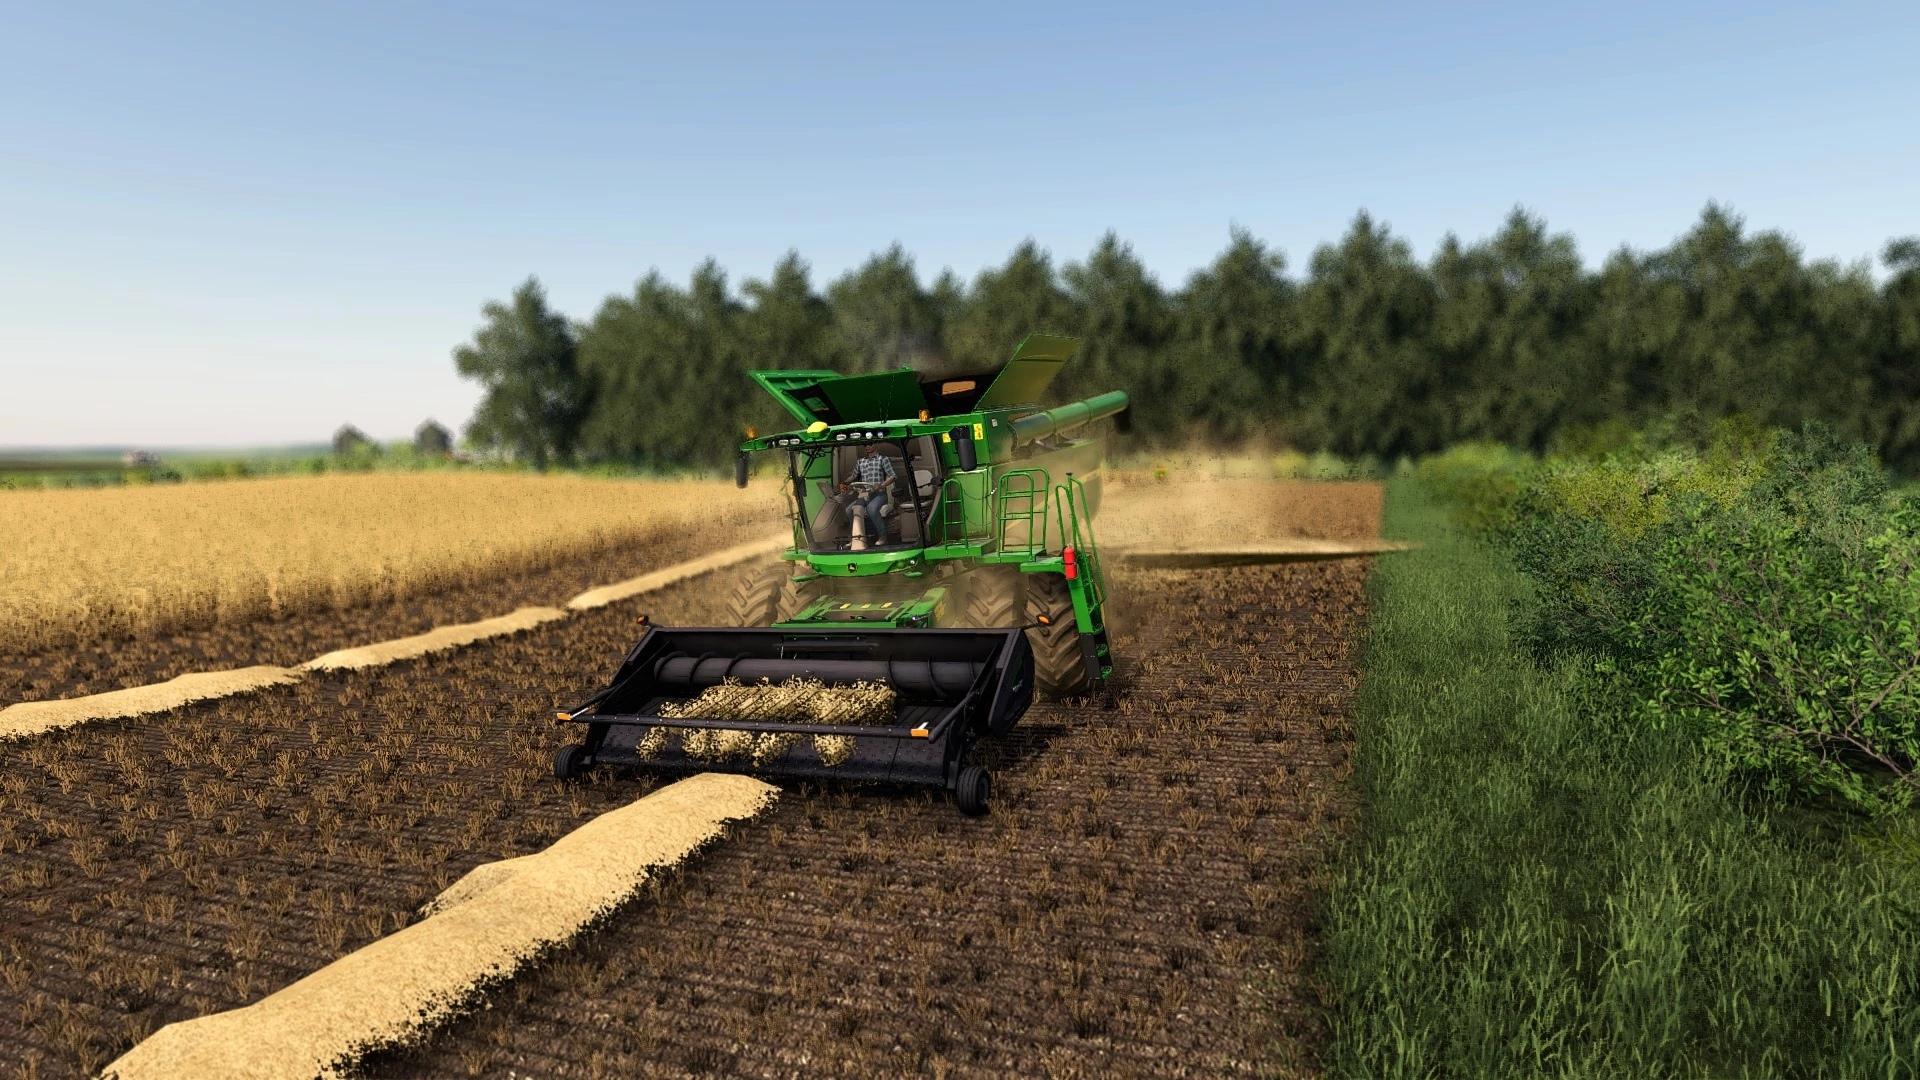 Мод MacDon PW8 Pick-Up для Farming Simulator 2019